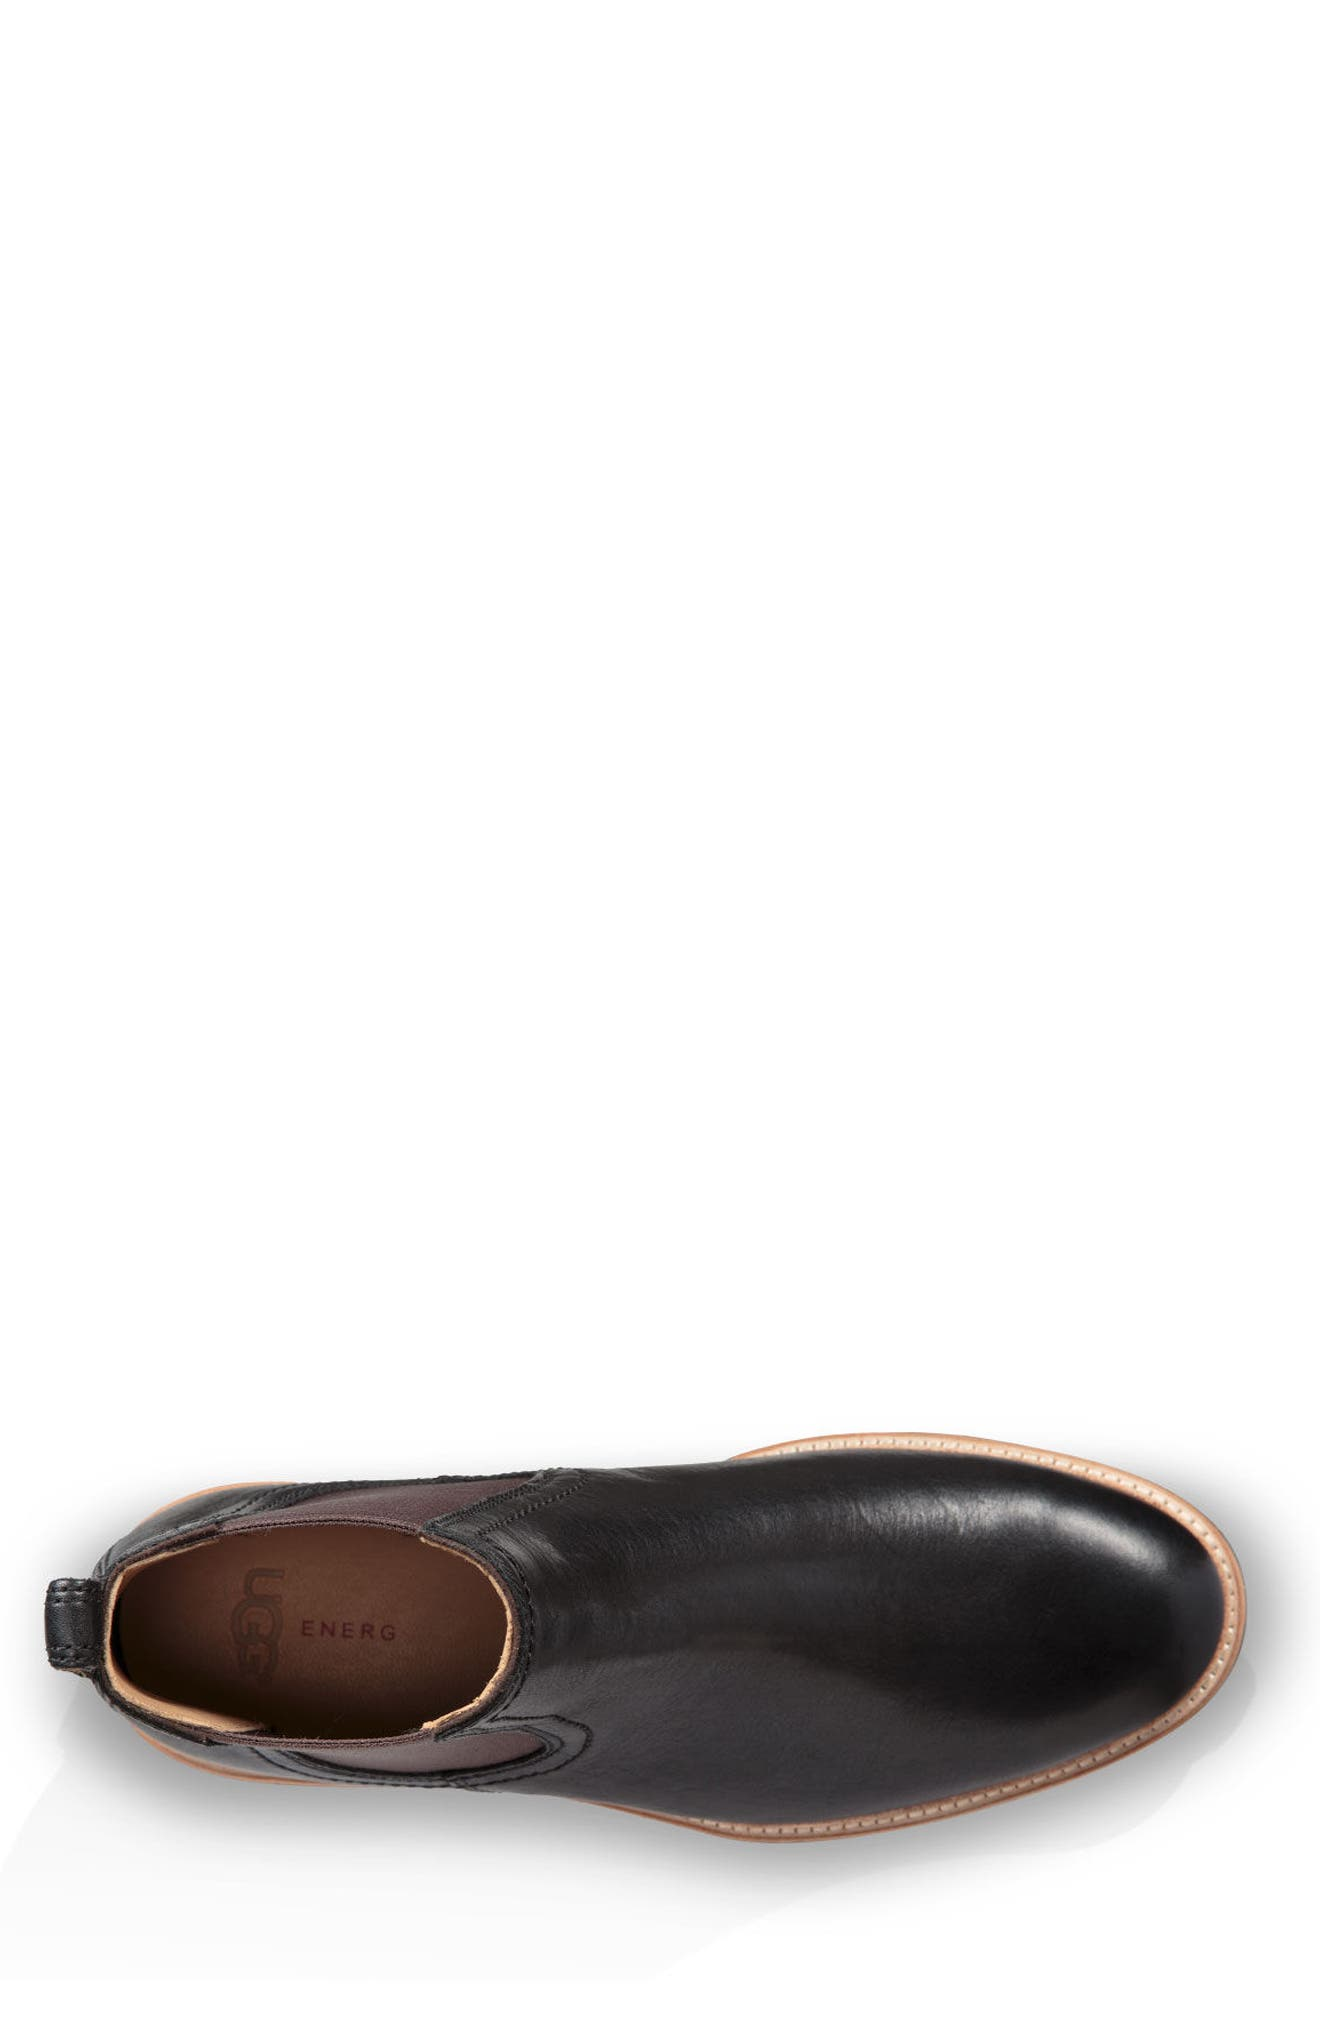 Baldvin Chelsea Boot,                             Alternate thumbnail 4, color,                             BLACK LEATHER/SUEDE